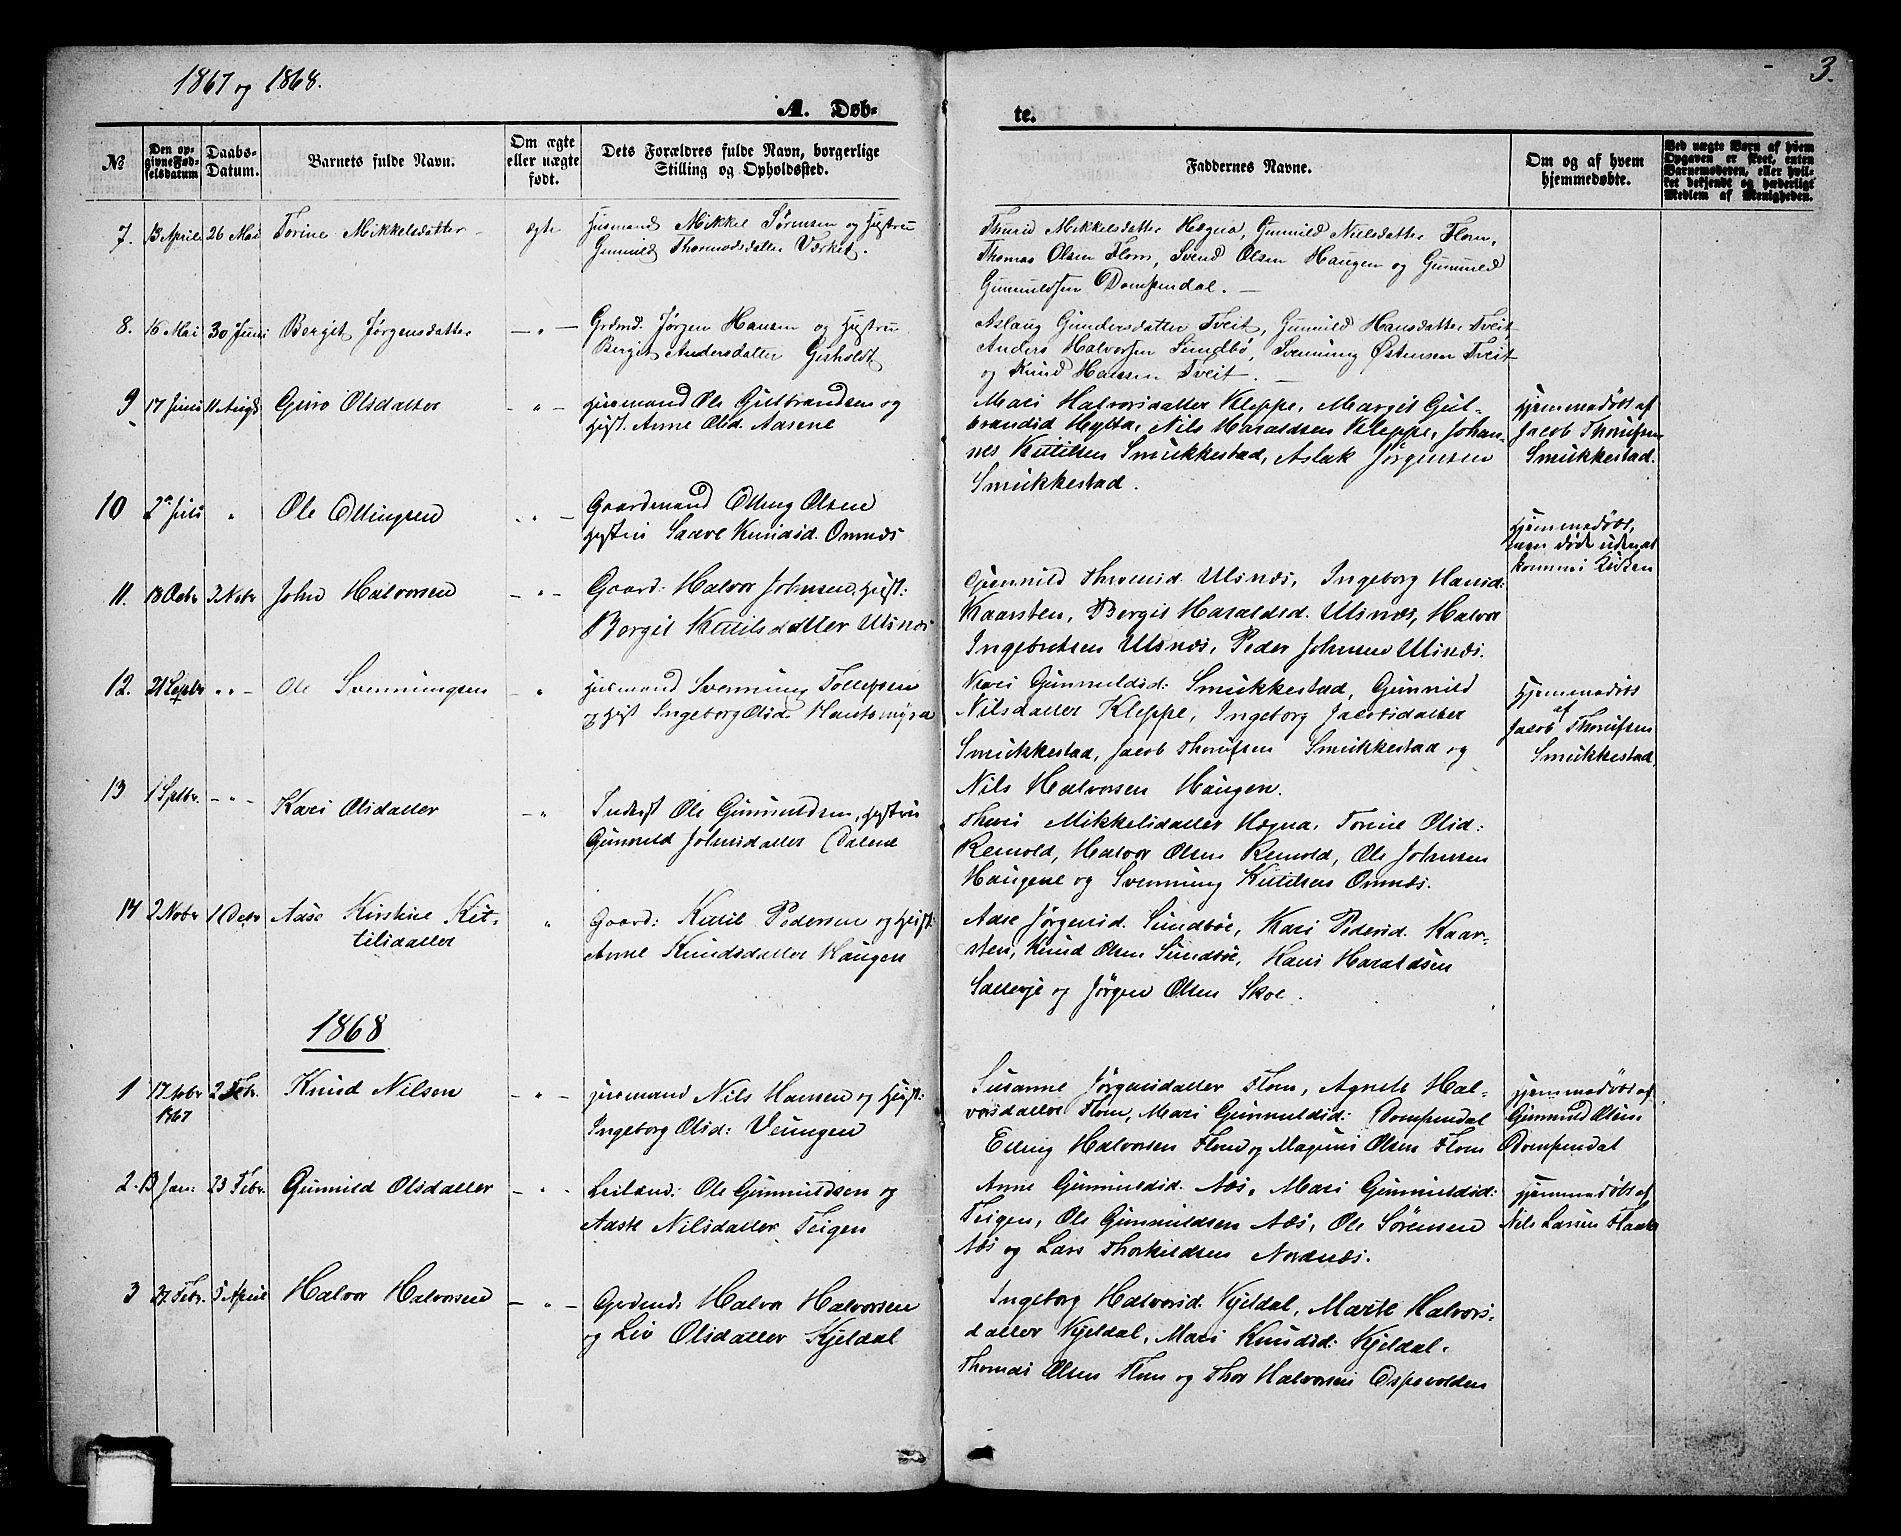 SAKO, Lunde kirkebøker, G/Gb/L0001: Klokkerbok nr. II 1, 1866-1887, s. 3